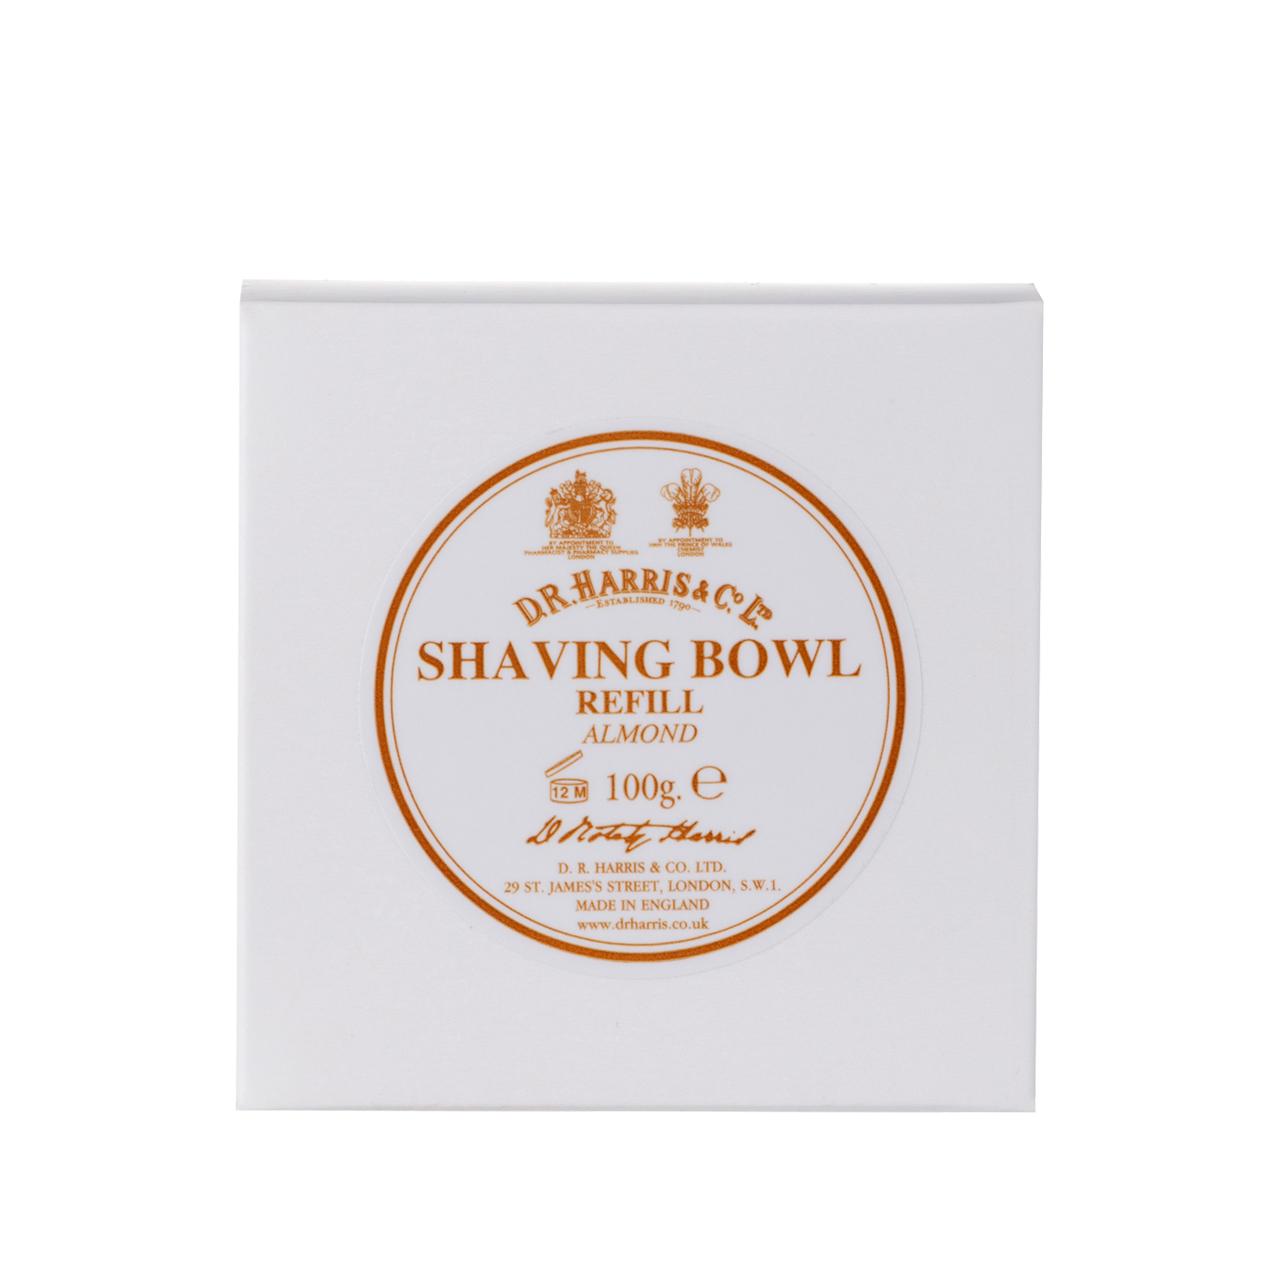 Almond - Shaving Soap Refill